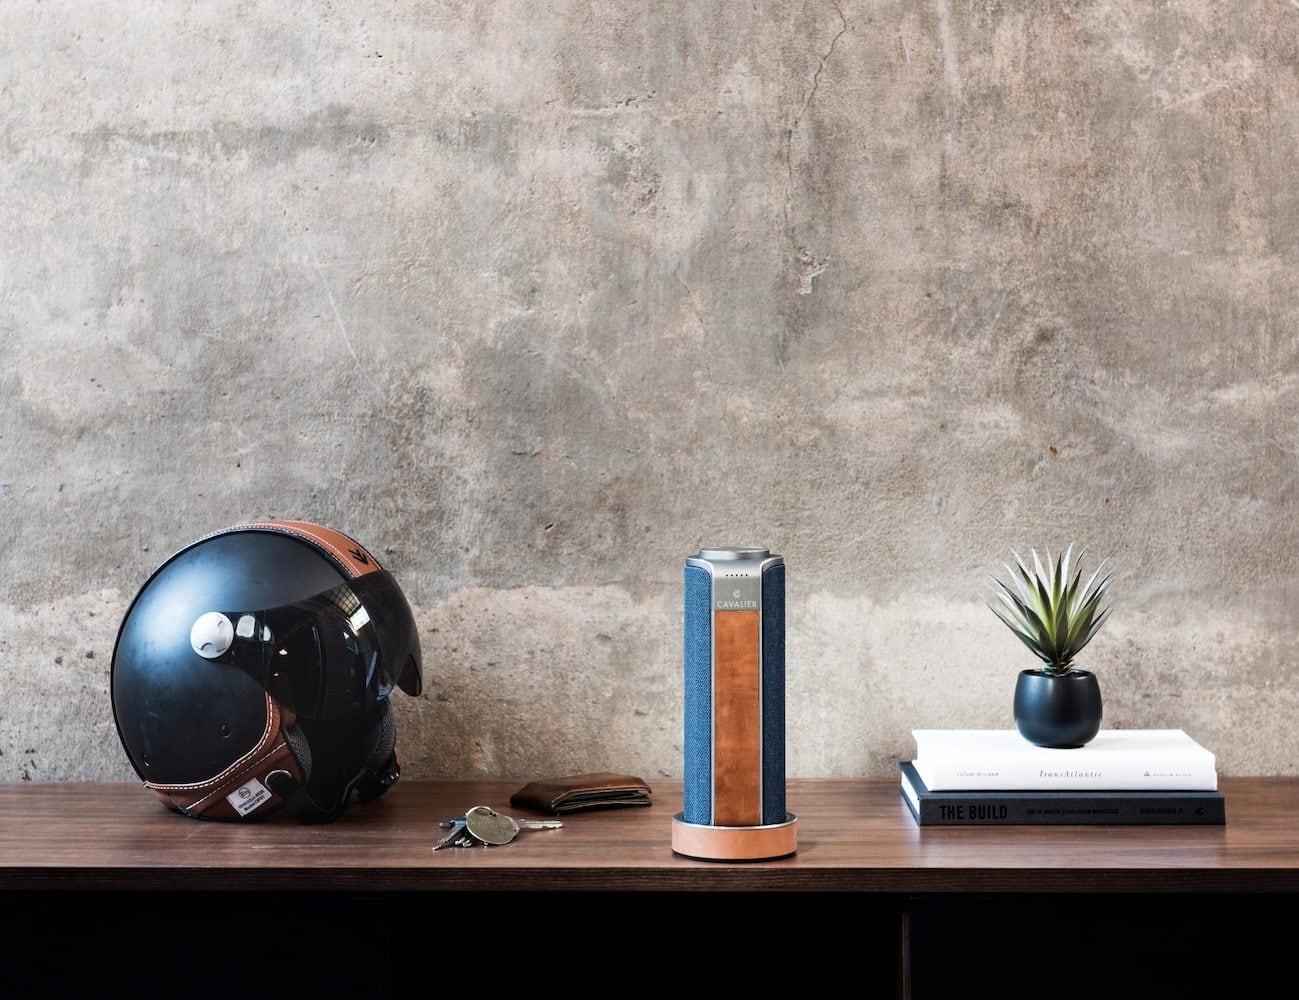 Cavalier Maverick Portable Alexa Speaker System gives you hands-free control